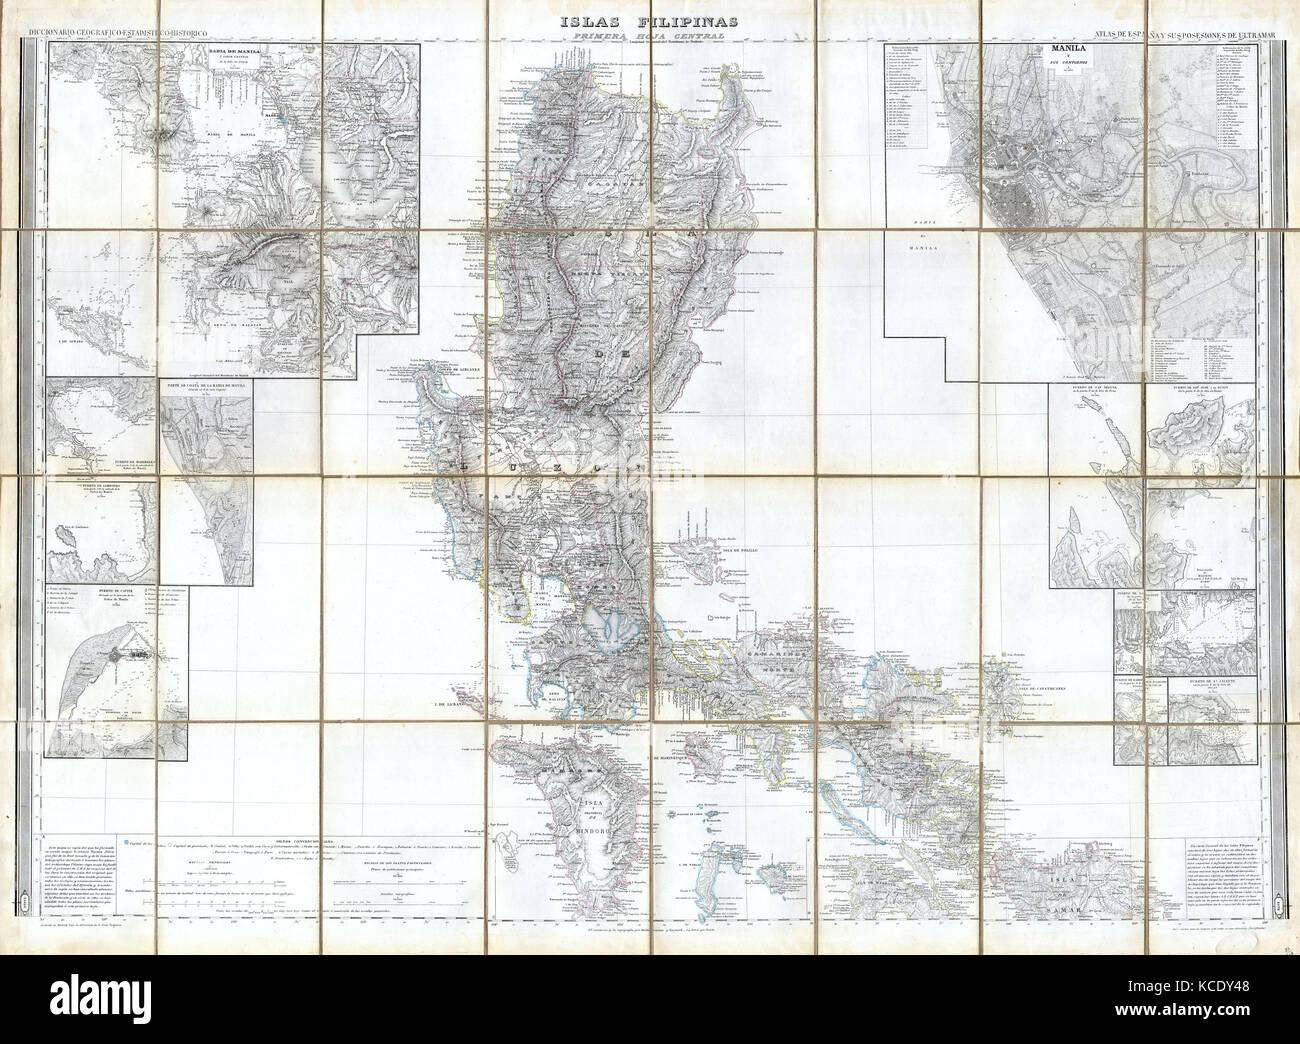 1852 Coello Morata Case Map of the Philippines Stock Photo